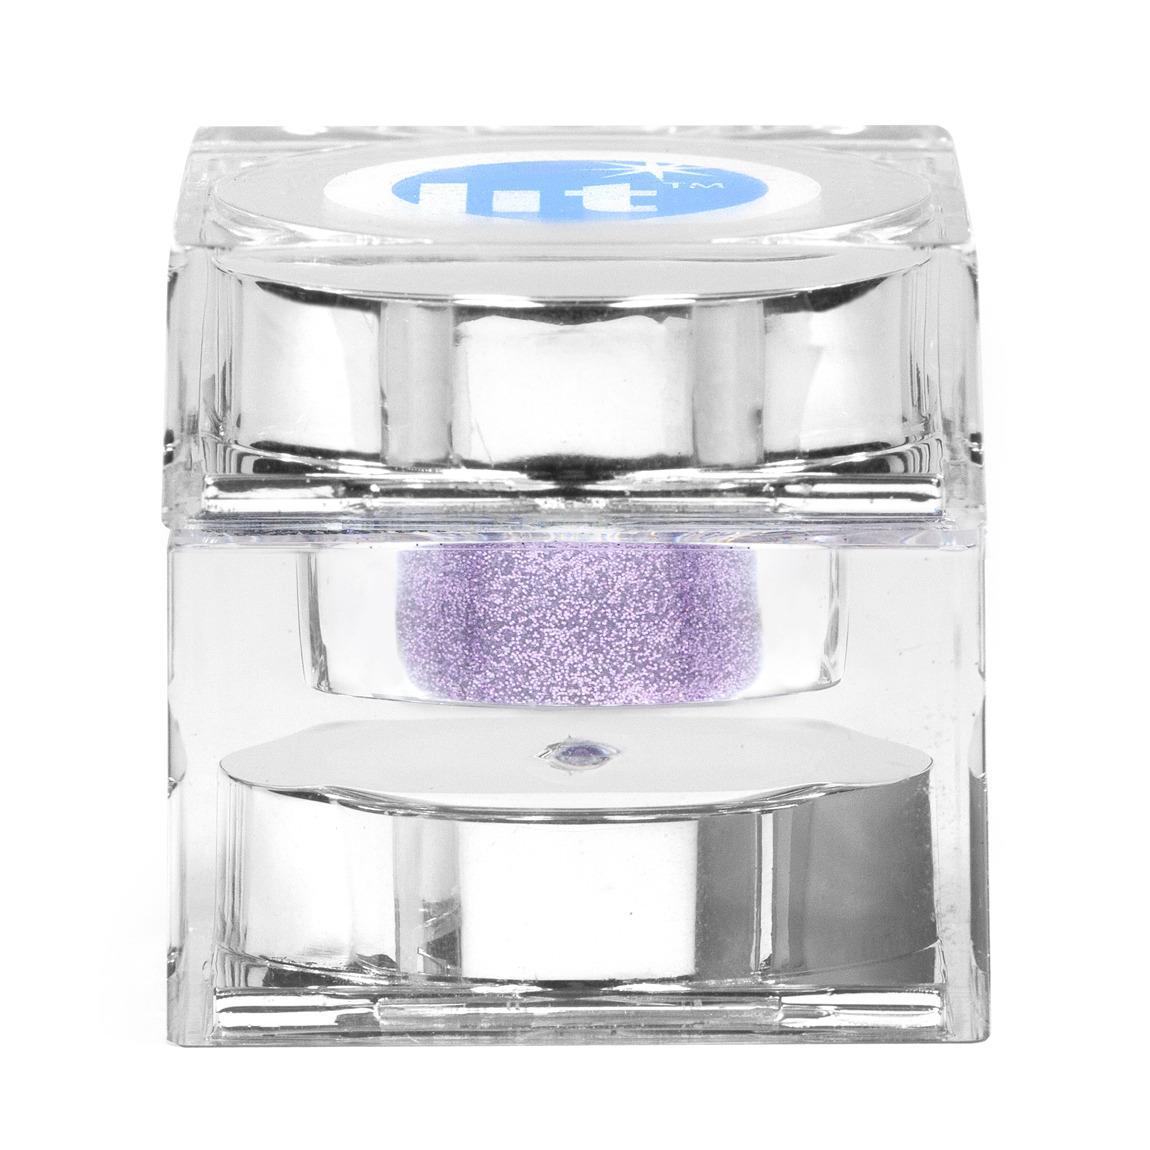 Lit Cosmetics Lit Glitter Twisted Sistah S2 (Solid) alternative view 1.